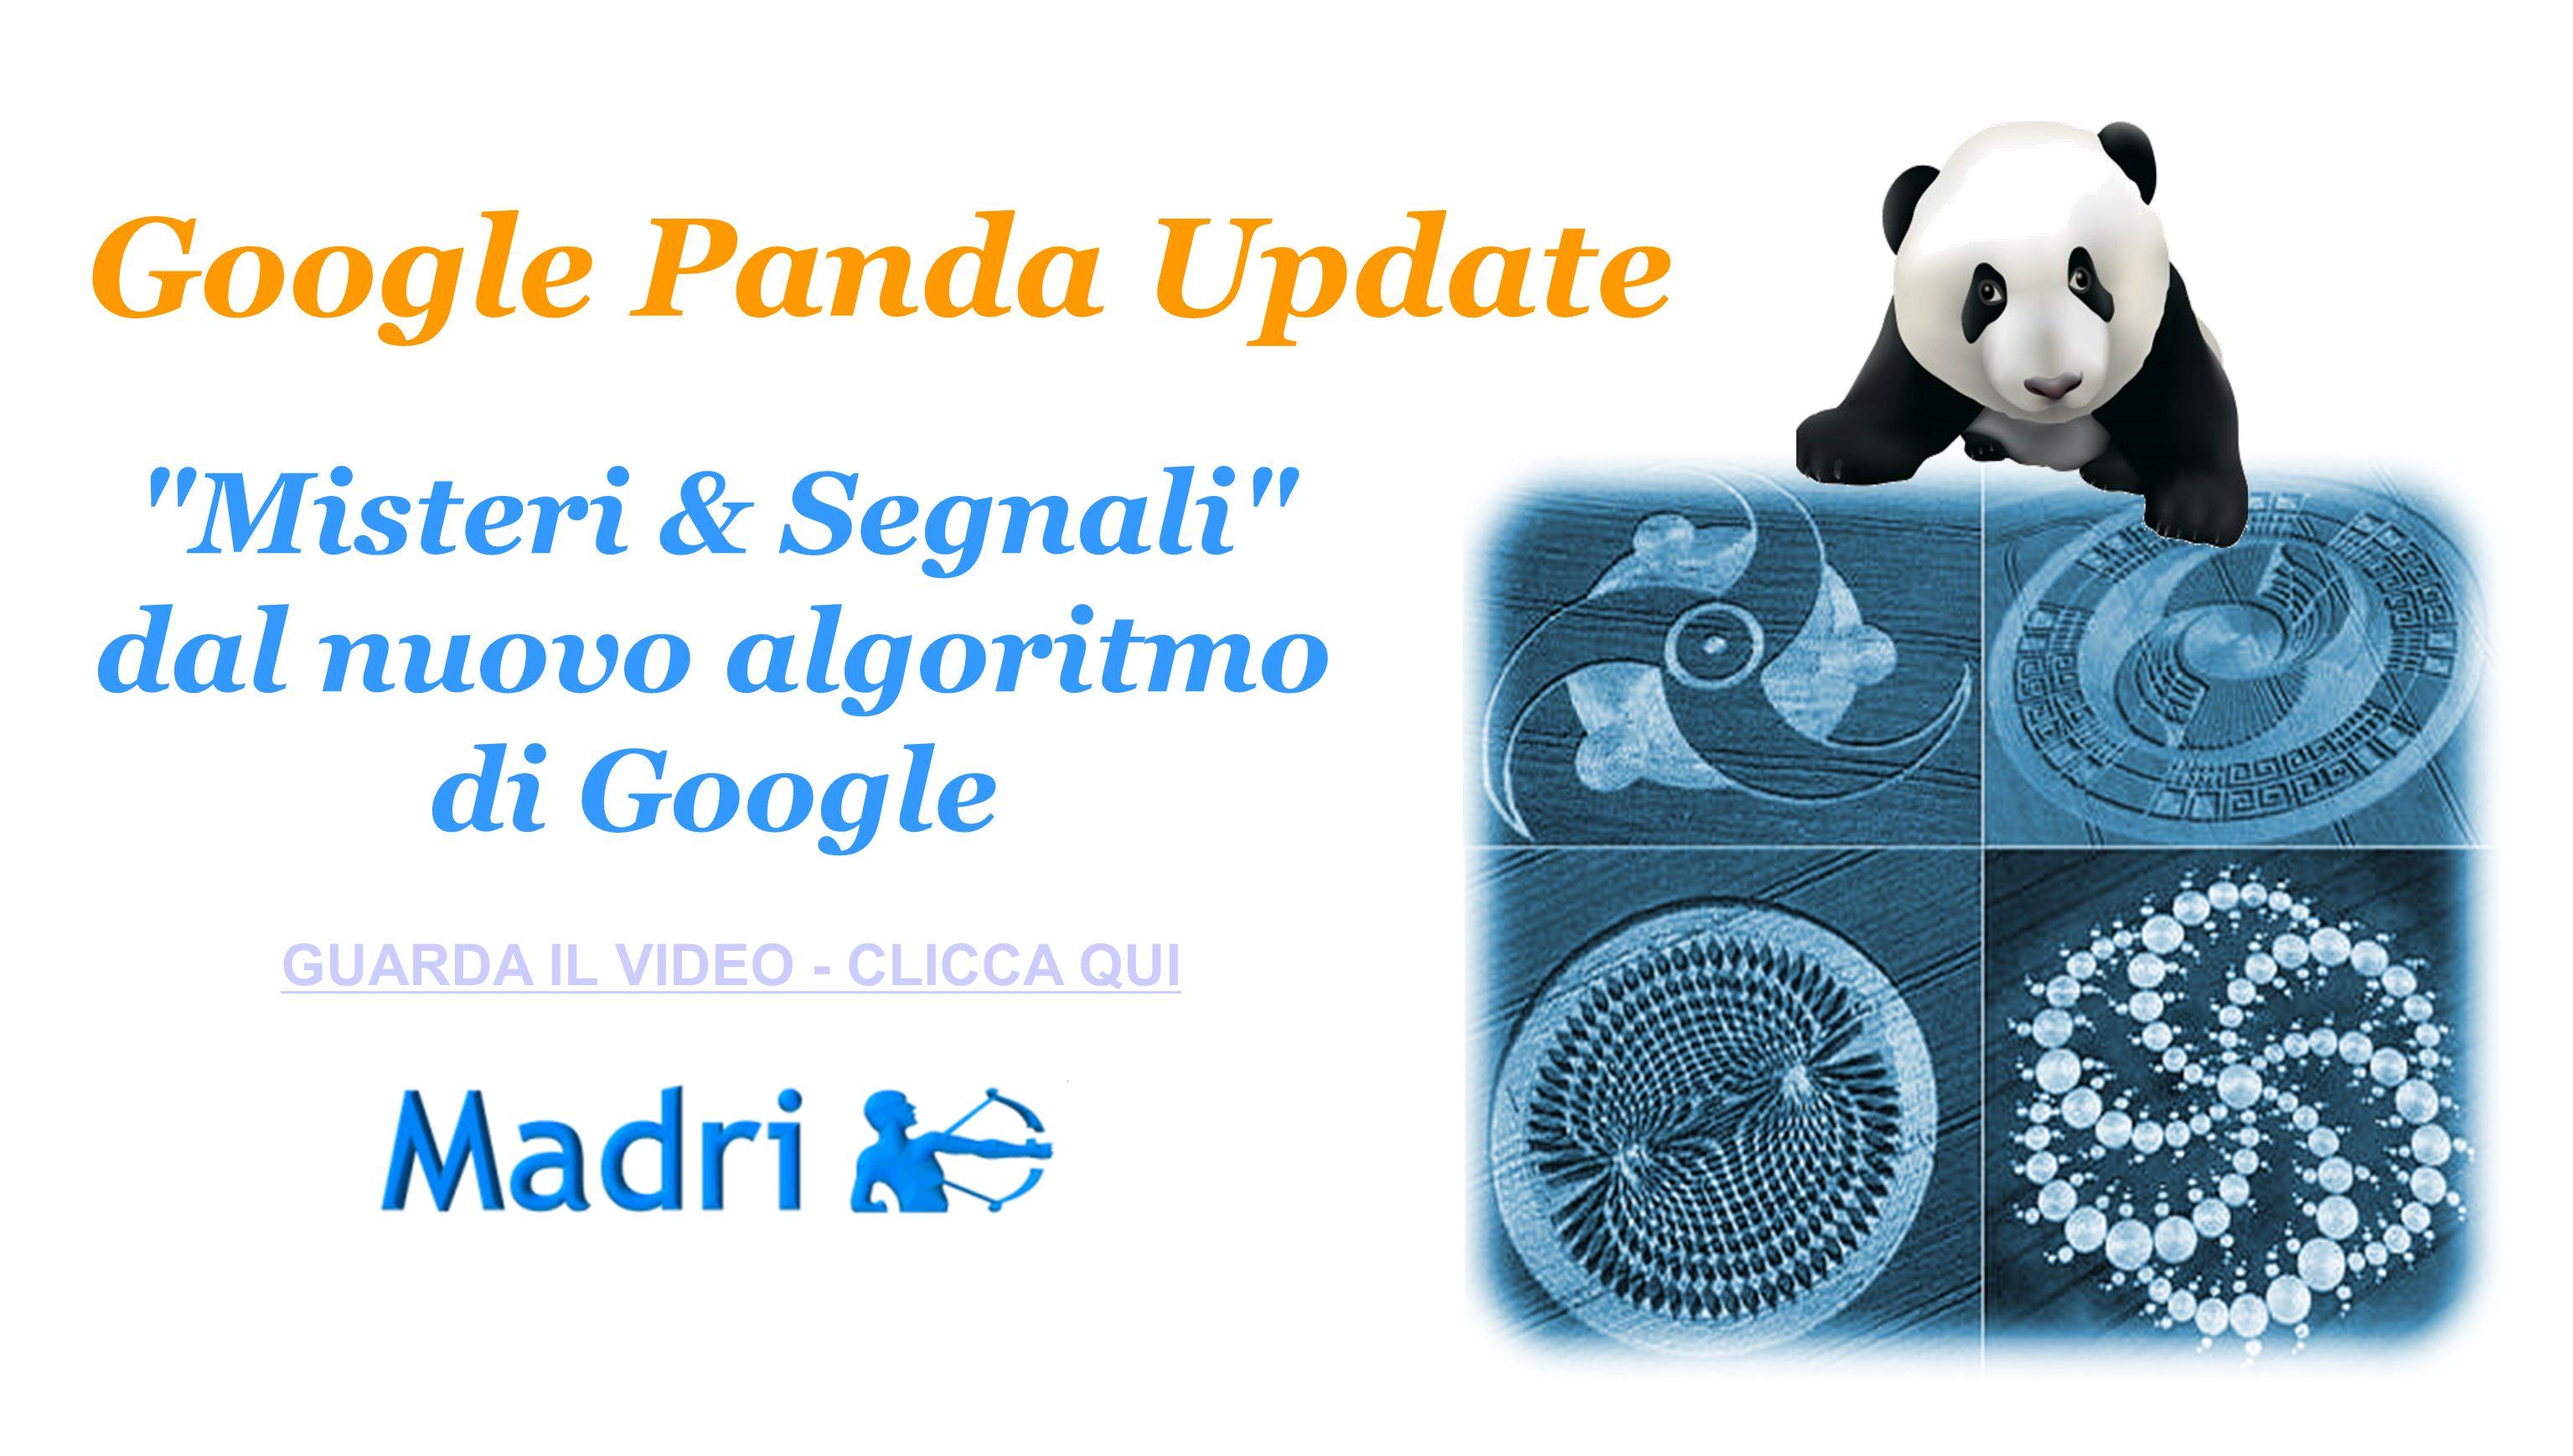 Google Panda Update Misteri & Segnali dal nuovo algoritmo di Google